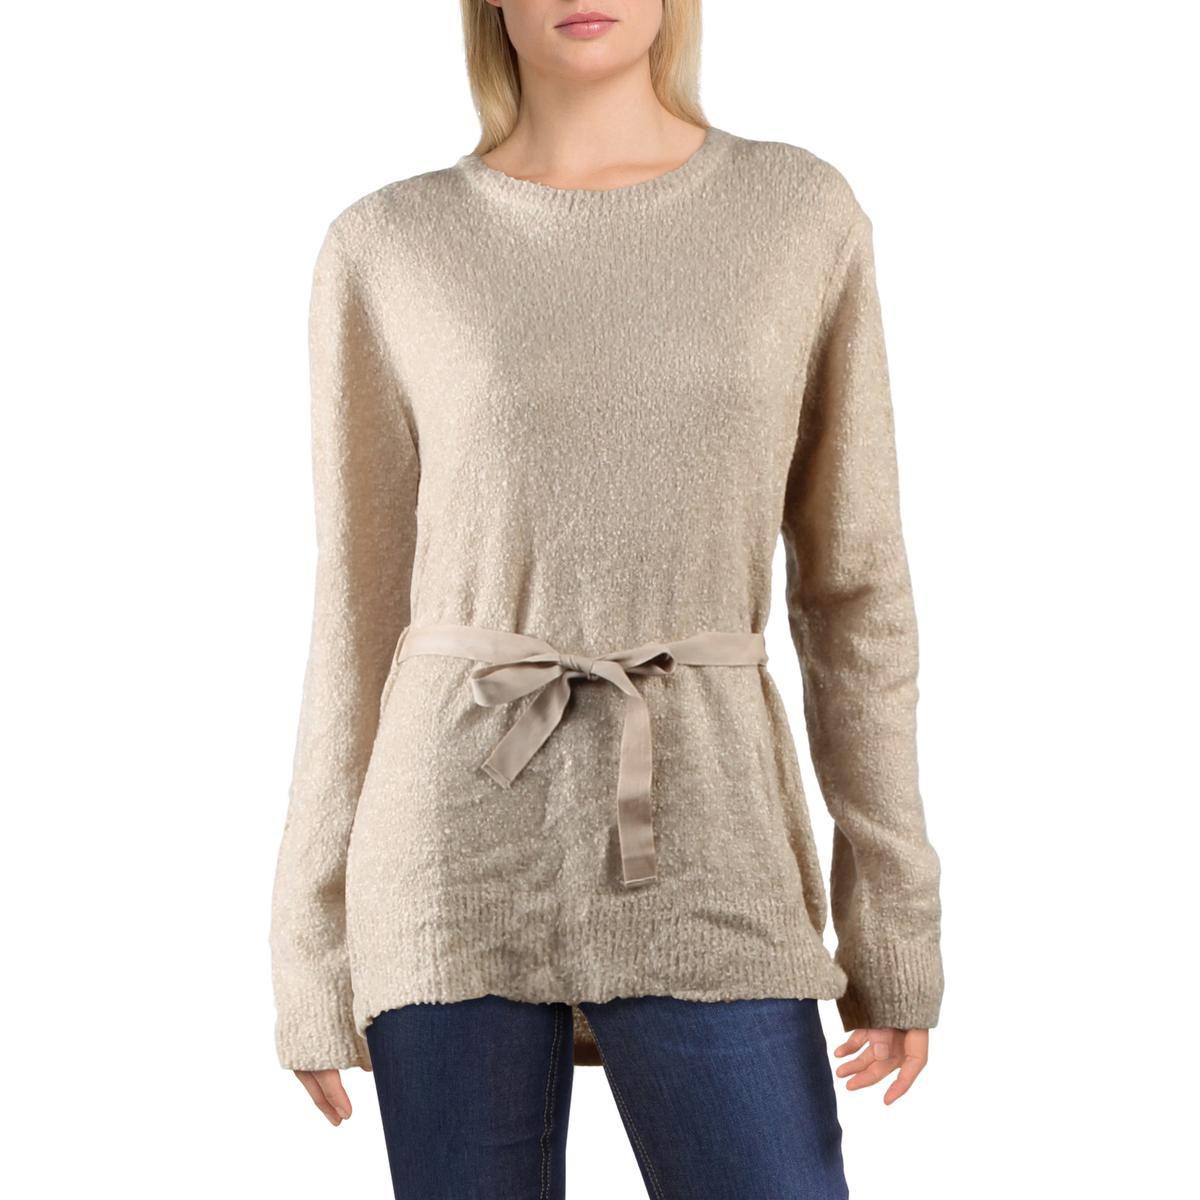 Current  Air Womens Pullover Sweater Beige Size Medium